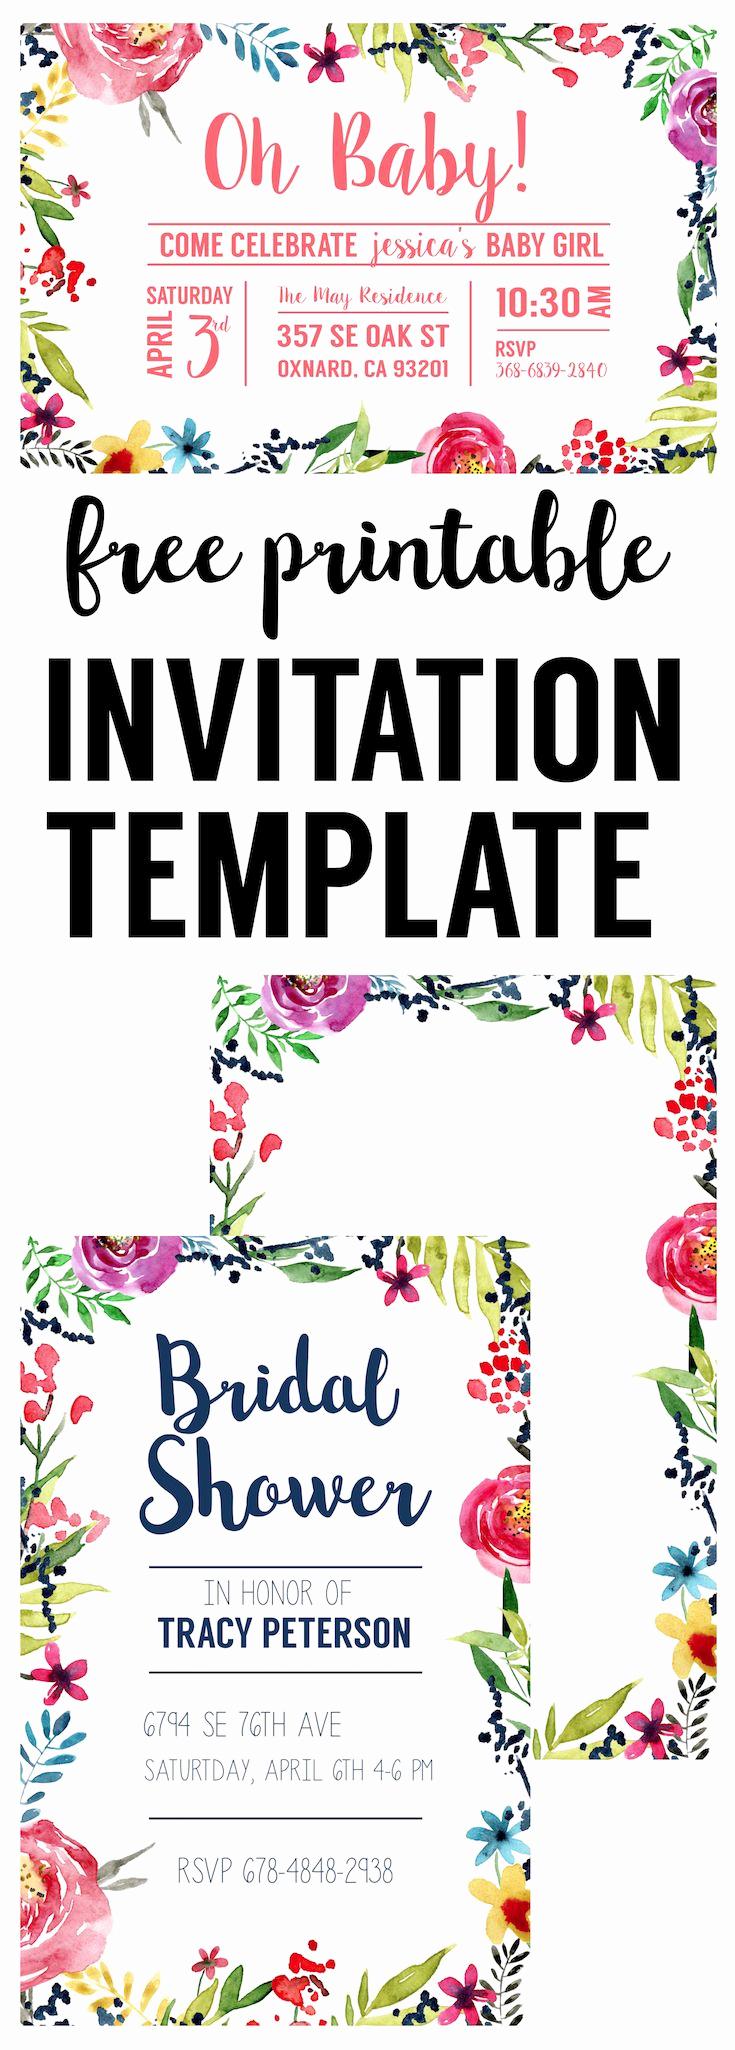 Free Printable Birthday Invitation Templates Best Of Floral Borders Invitations Free Printable Invitation